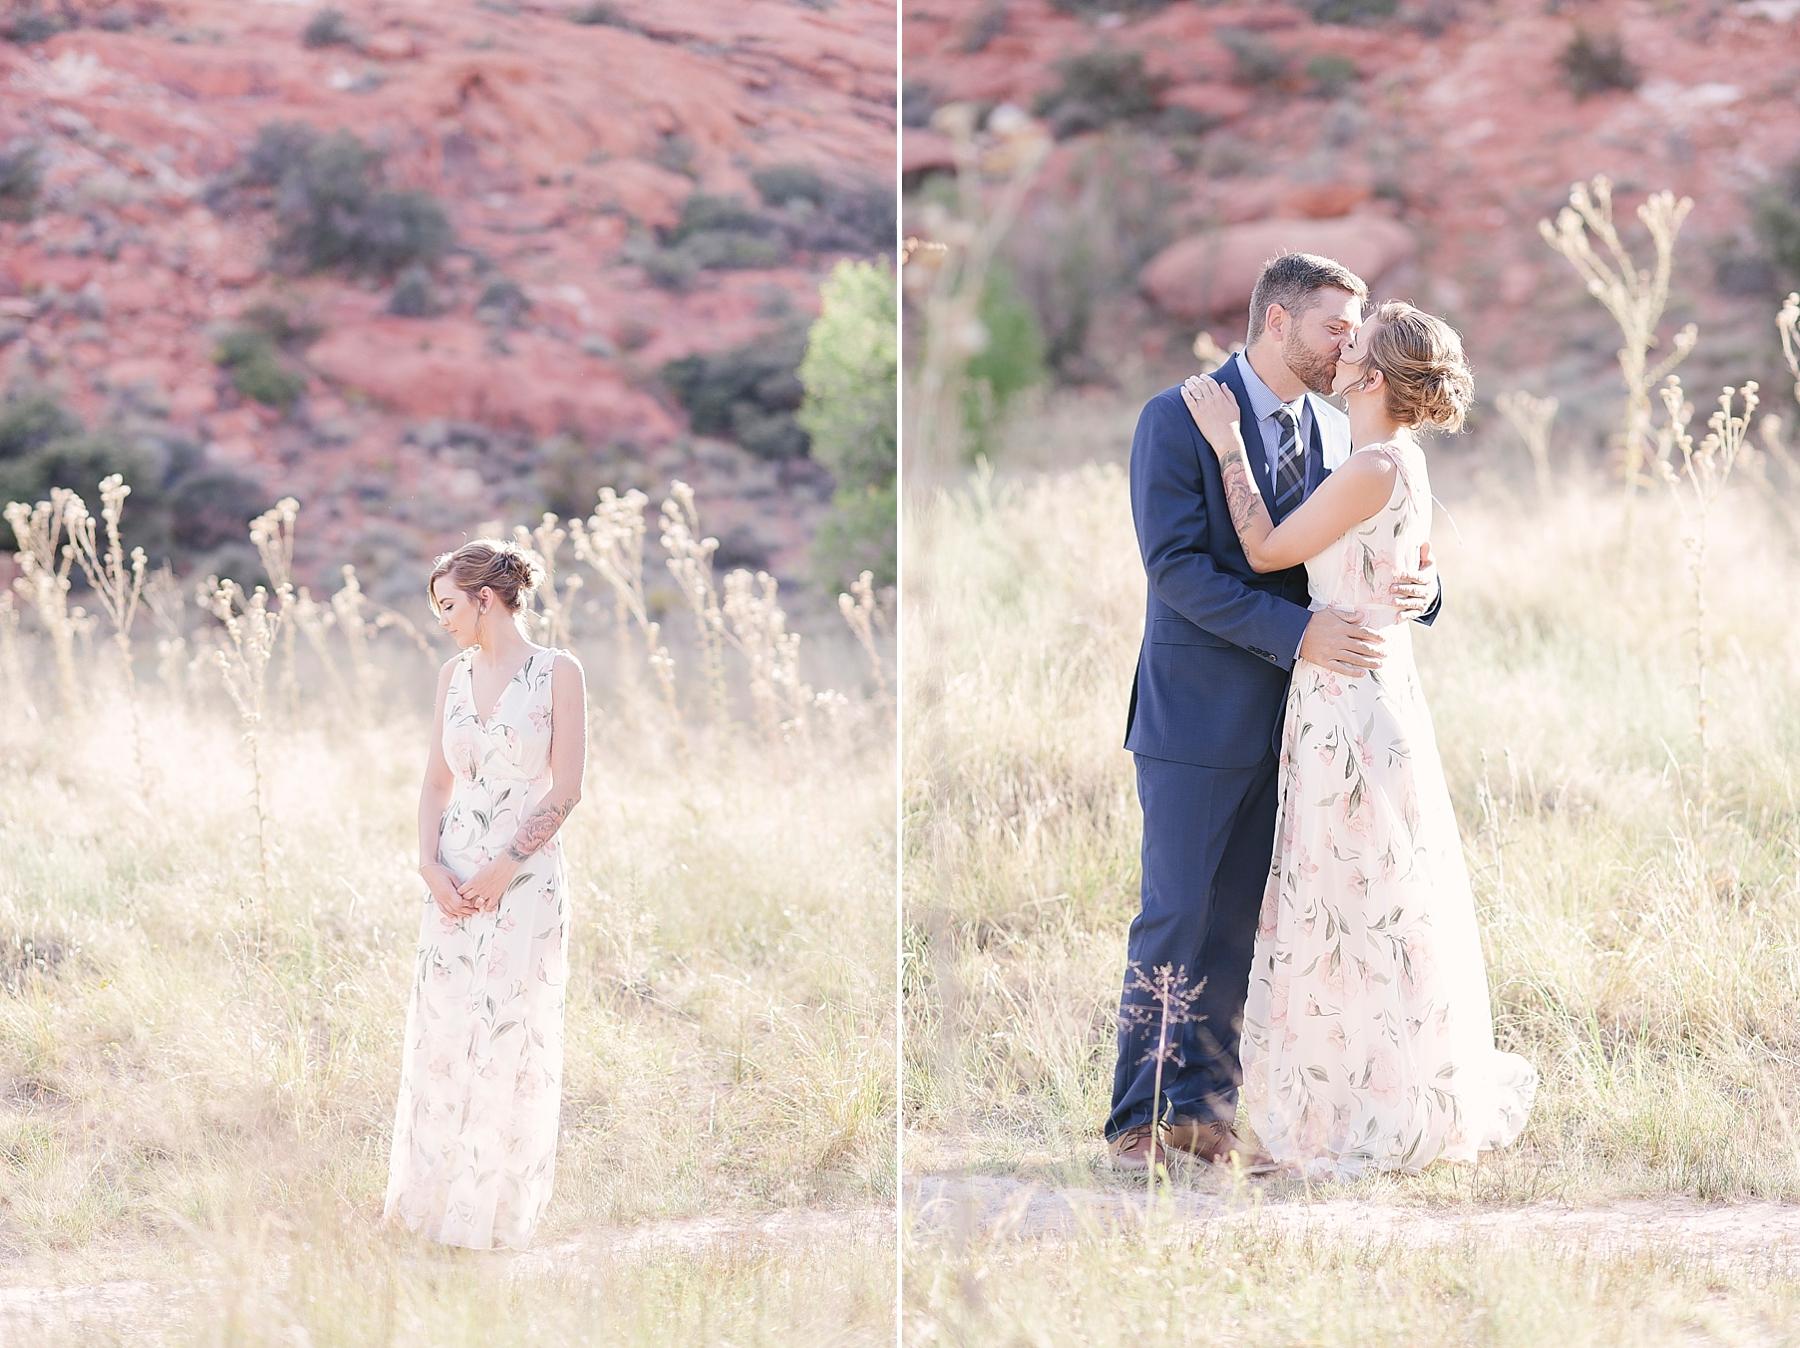 las_vegas_desert_elopement_wedding_photography-1-2.jpg